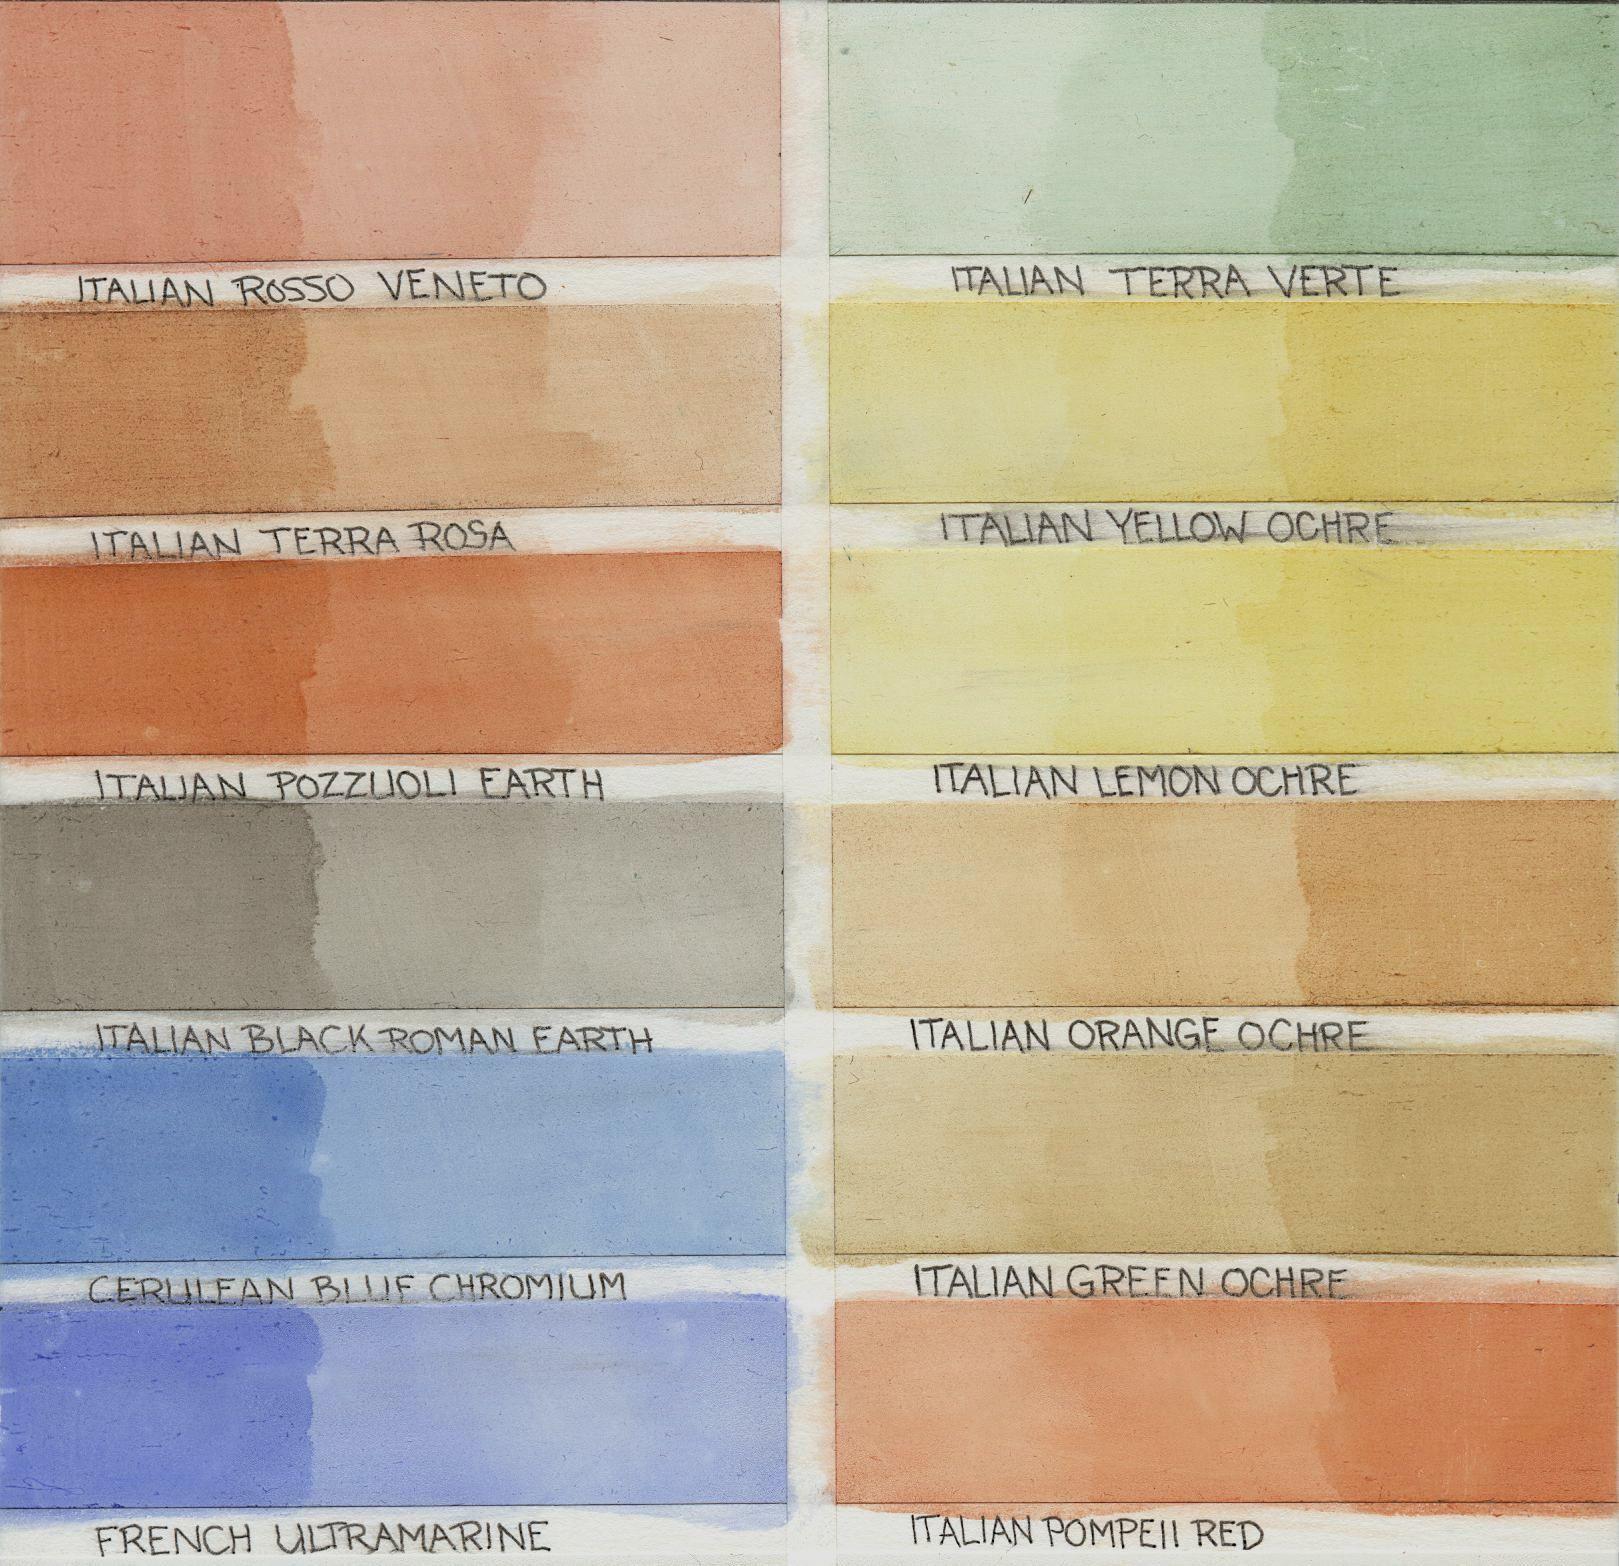 Http Marquetodd Com Wp Content Uploads 2013 05 Williamsburg Italian Earth Oil Paints Jpg Color Paint Refinishing Dream Home Design